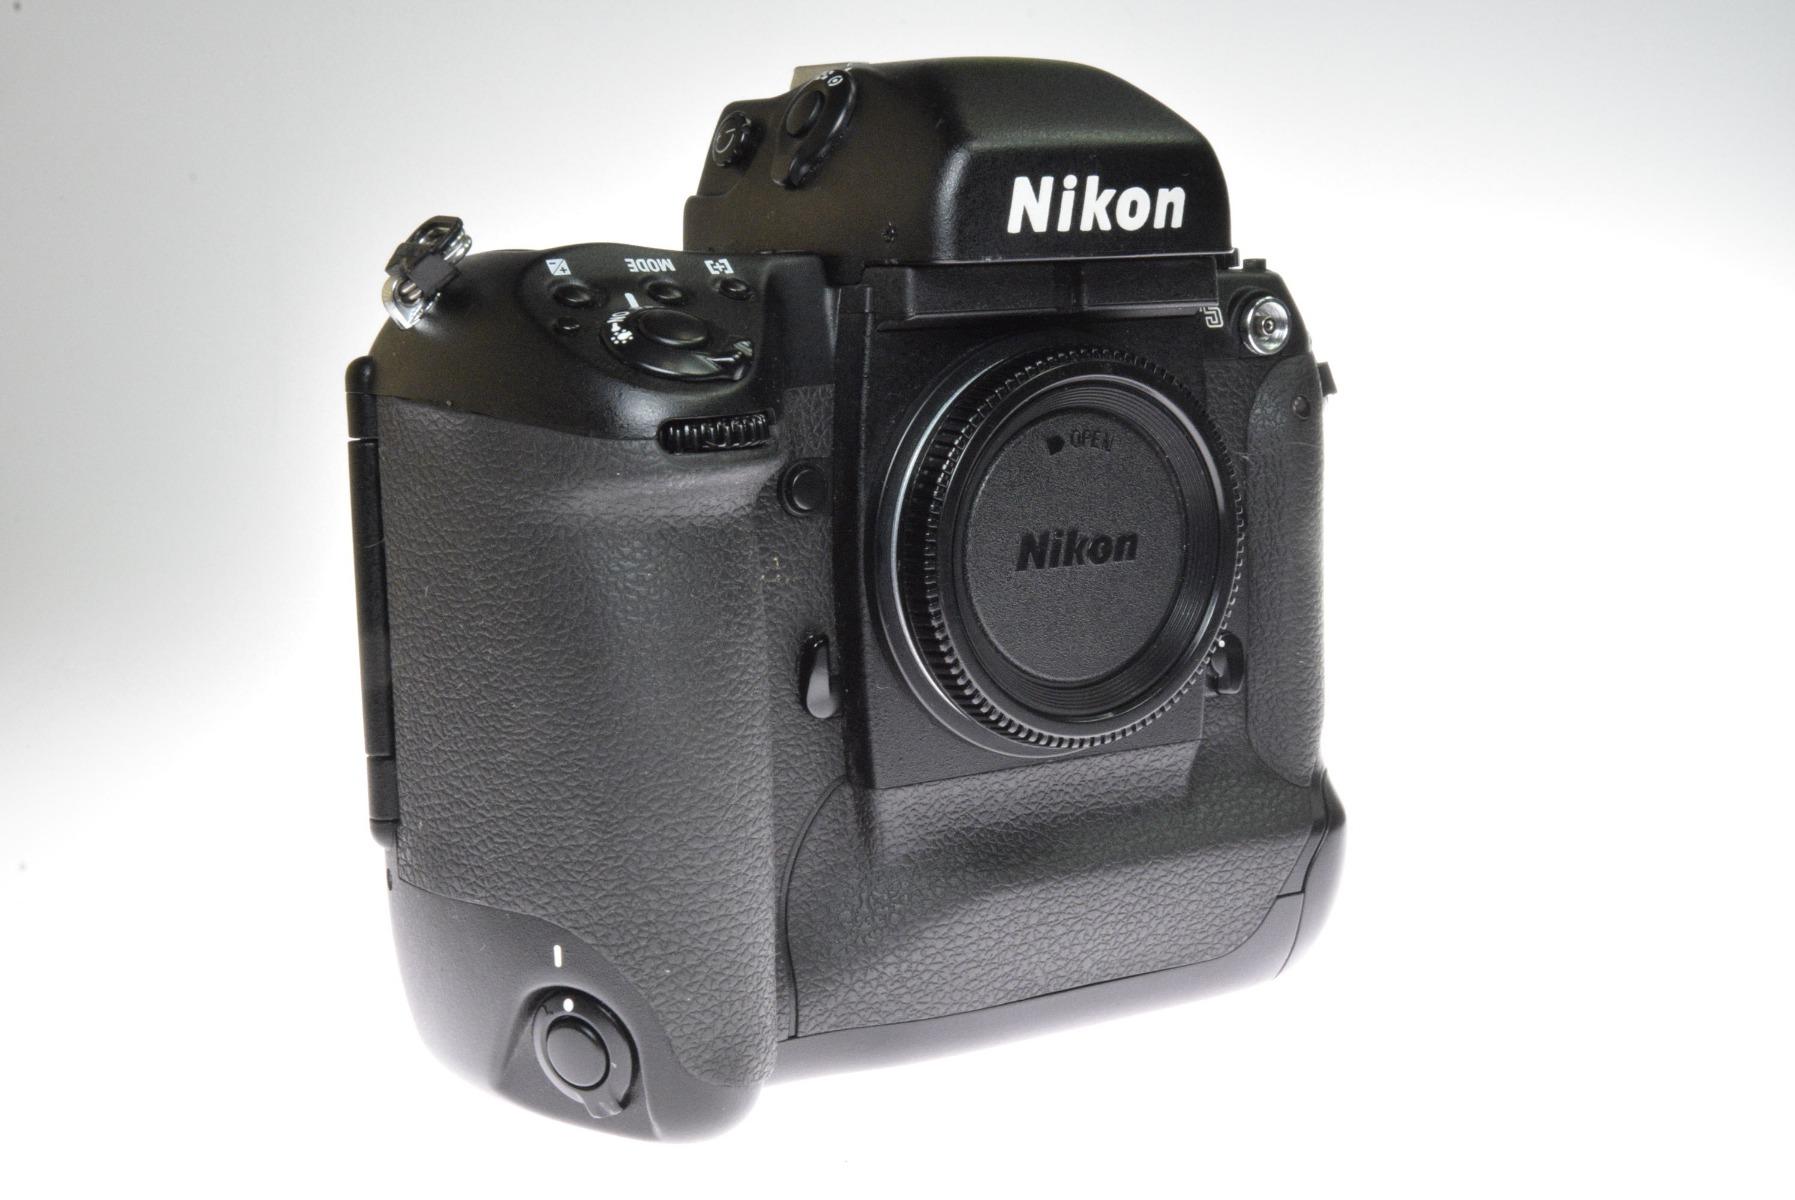 Used Nikon F5 35mm SLR Camera Body (Commission Sale)